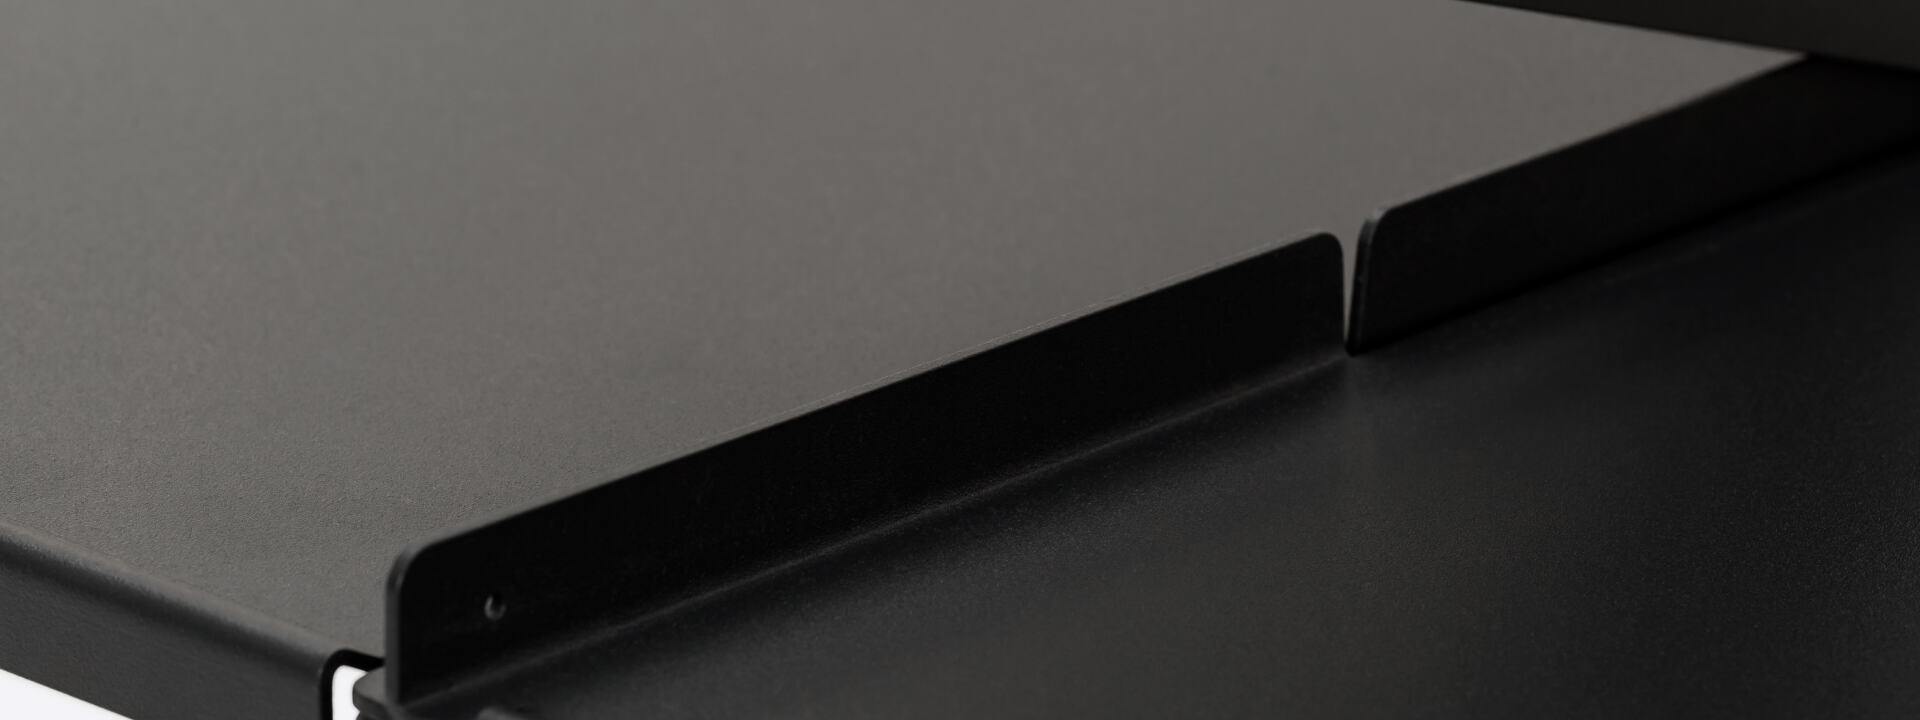 Plusminus Linoleum / MDF Regal, Regalsystem, Aufbewahrung, Regal, Büroregal, Linoleum, 3D, Regalsystem konfigurieren, Regalsystem